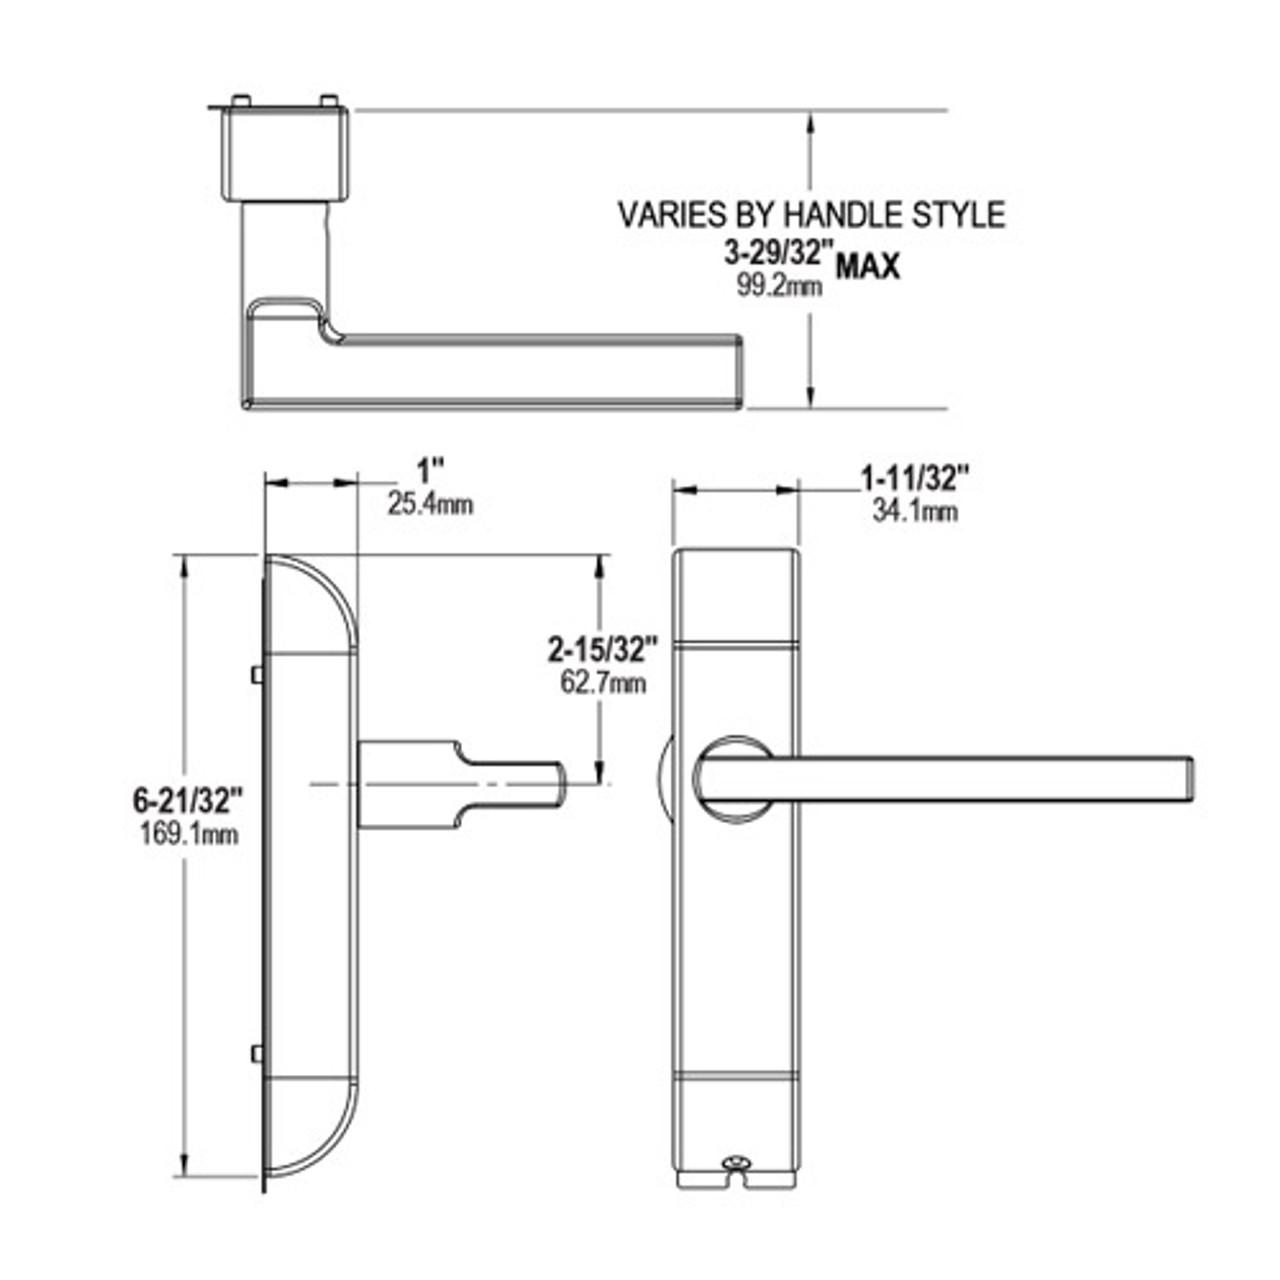 4600-MV-542-US32 Adams Rite MV Designer handle Dimensional View